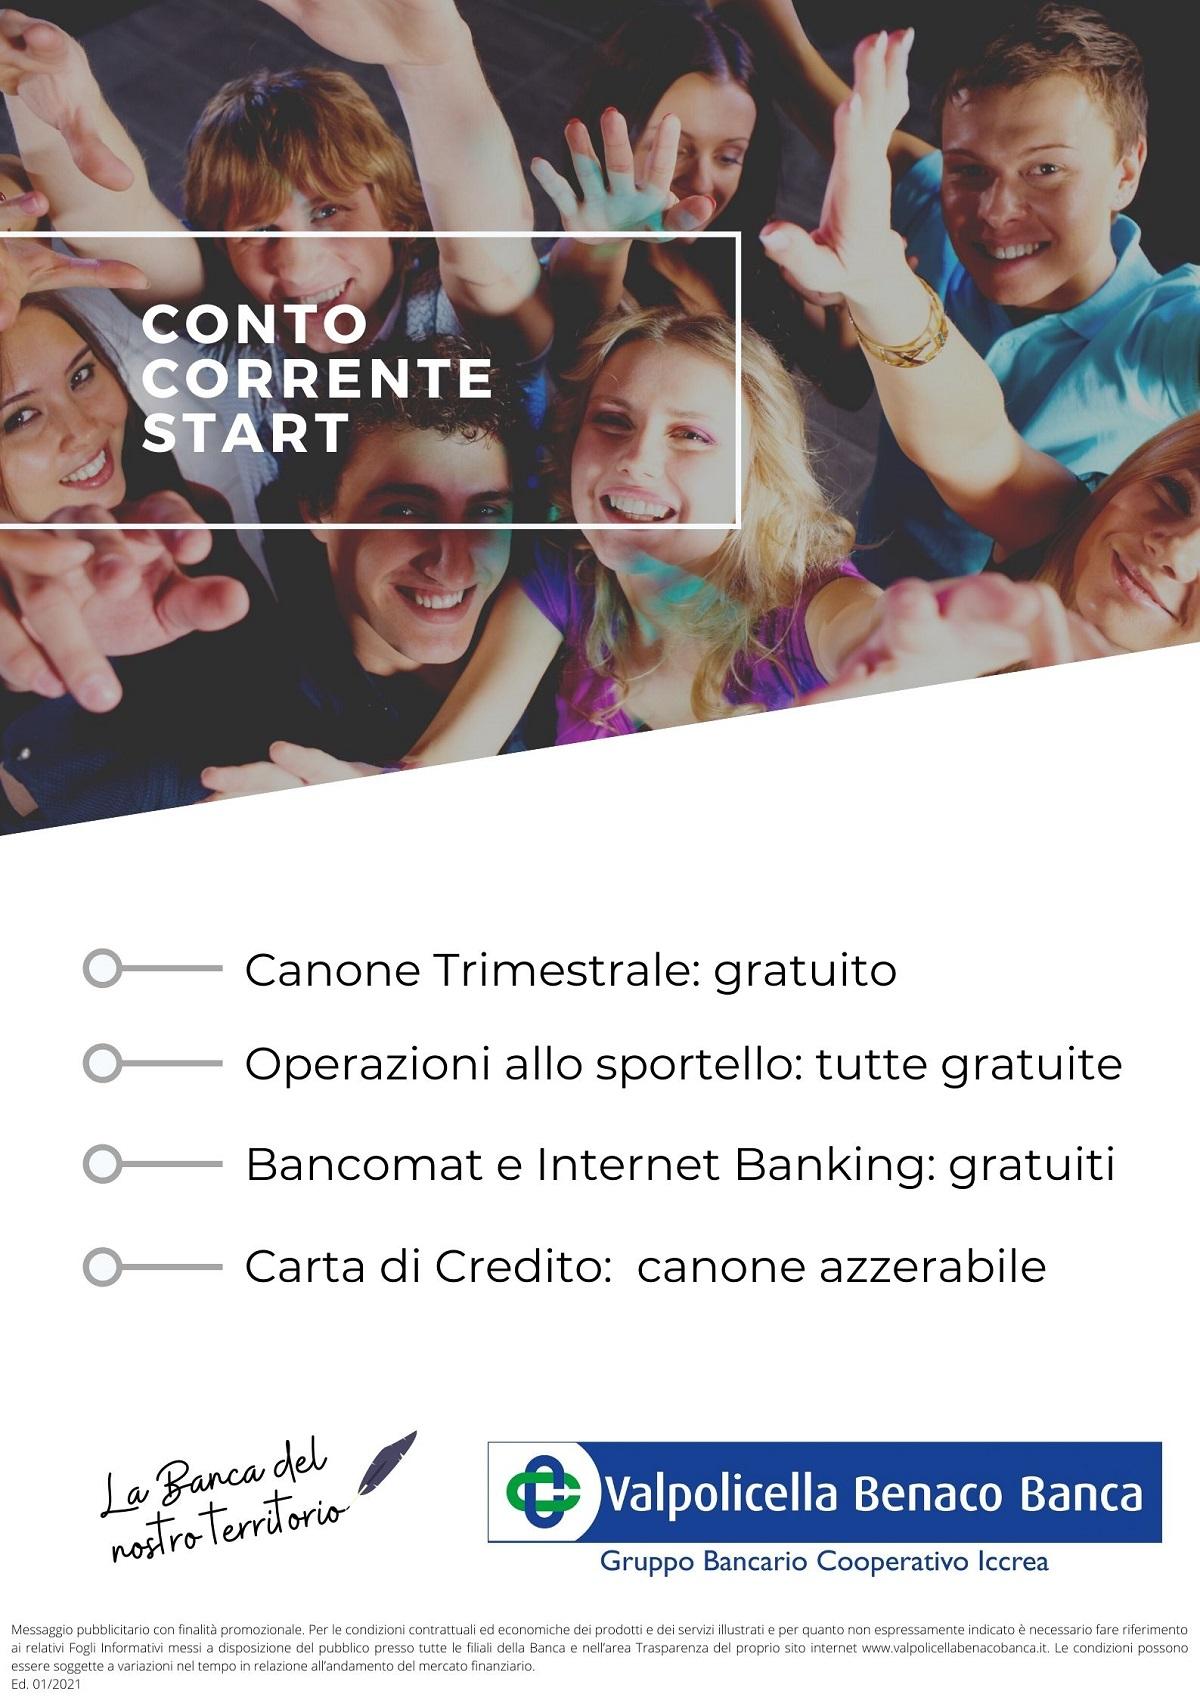 Conto Corrente Start 2021